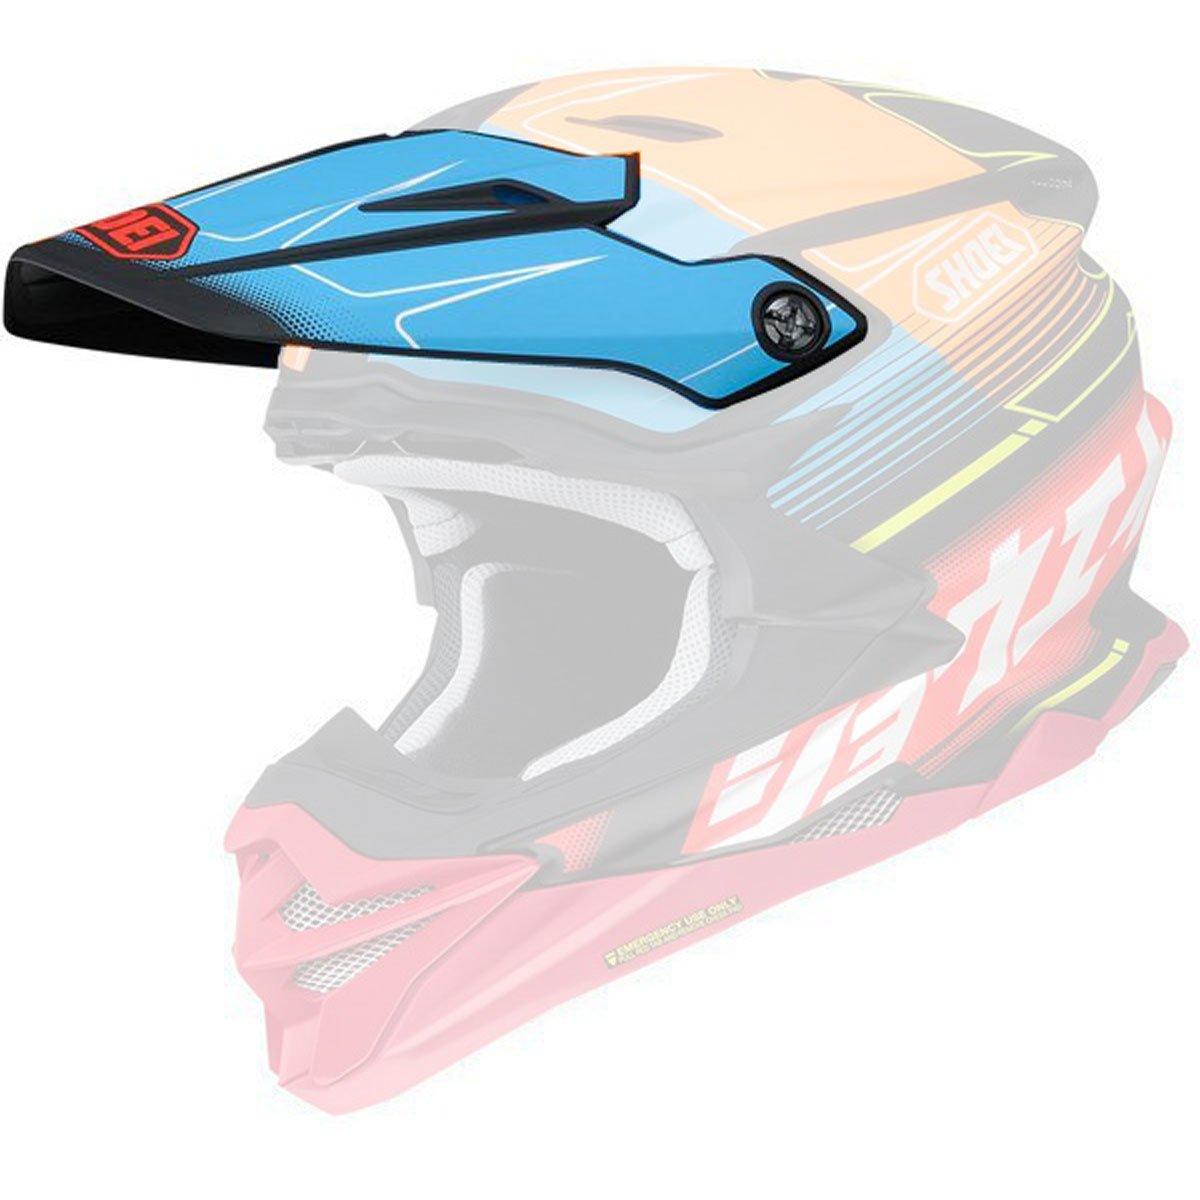 Shoei VFX-Evo Visor Zinger Off-Road Motorcycle Helmet Accessories - TC-10 / One Size